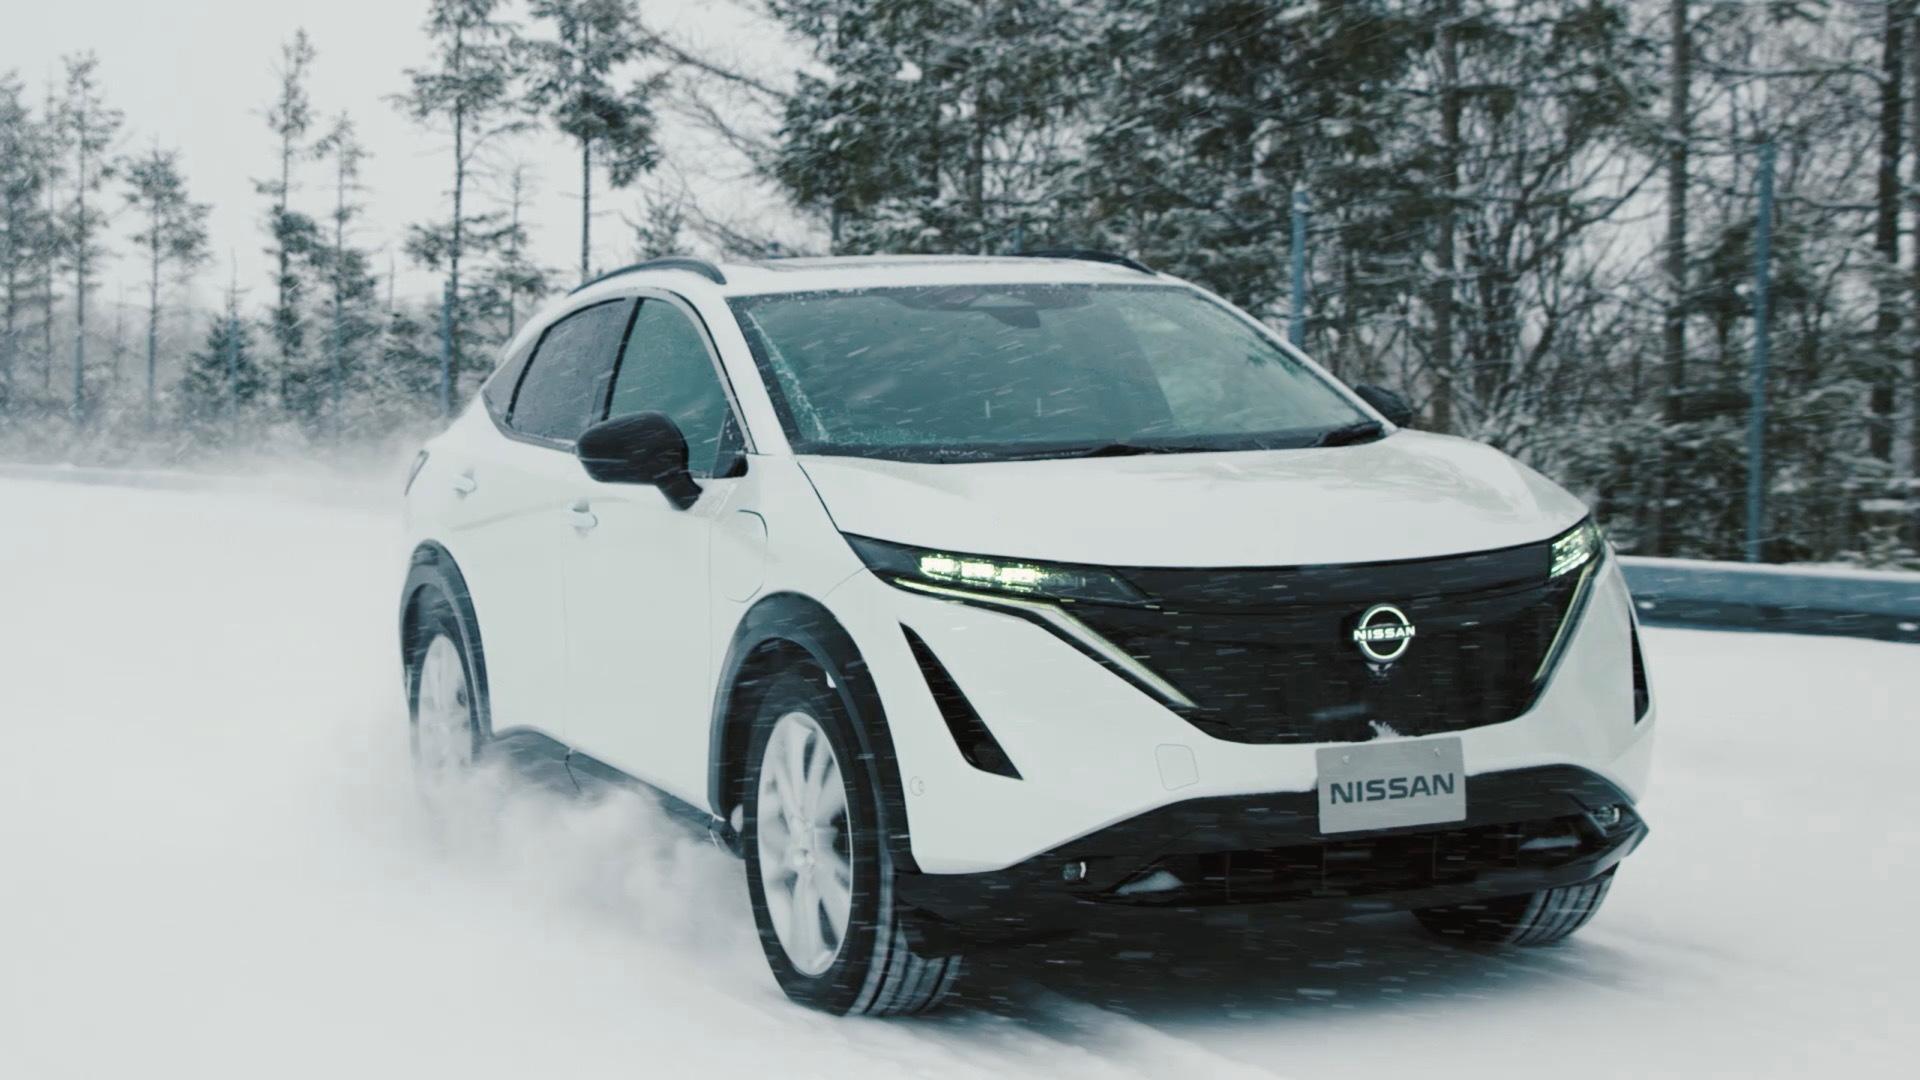 Nissan Ariya prototype testing